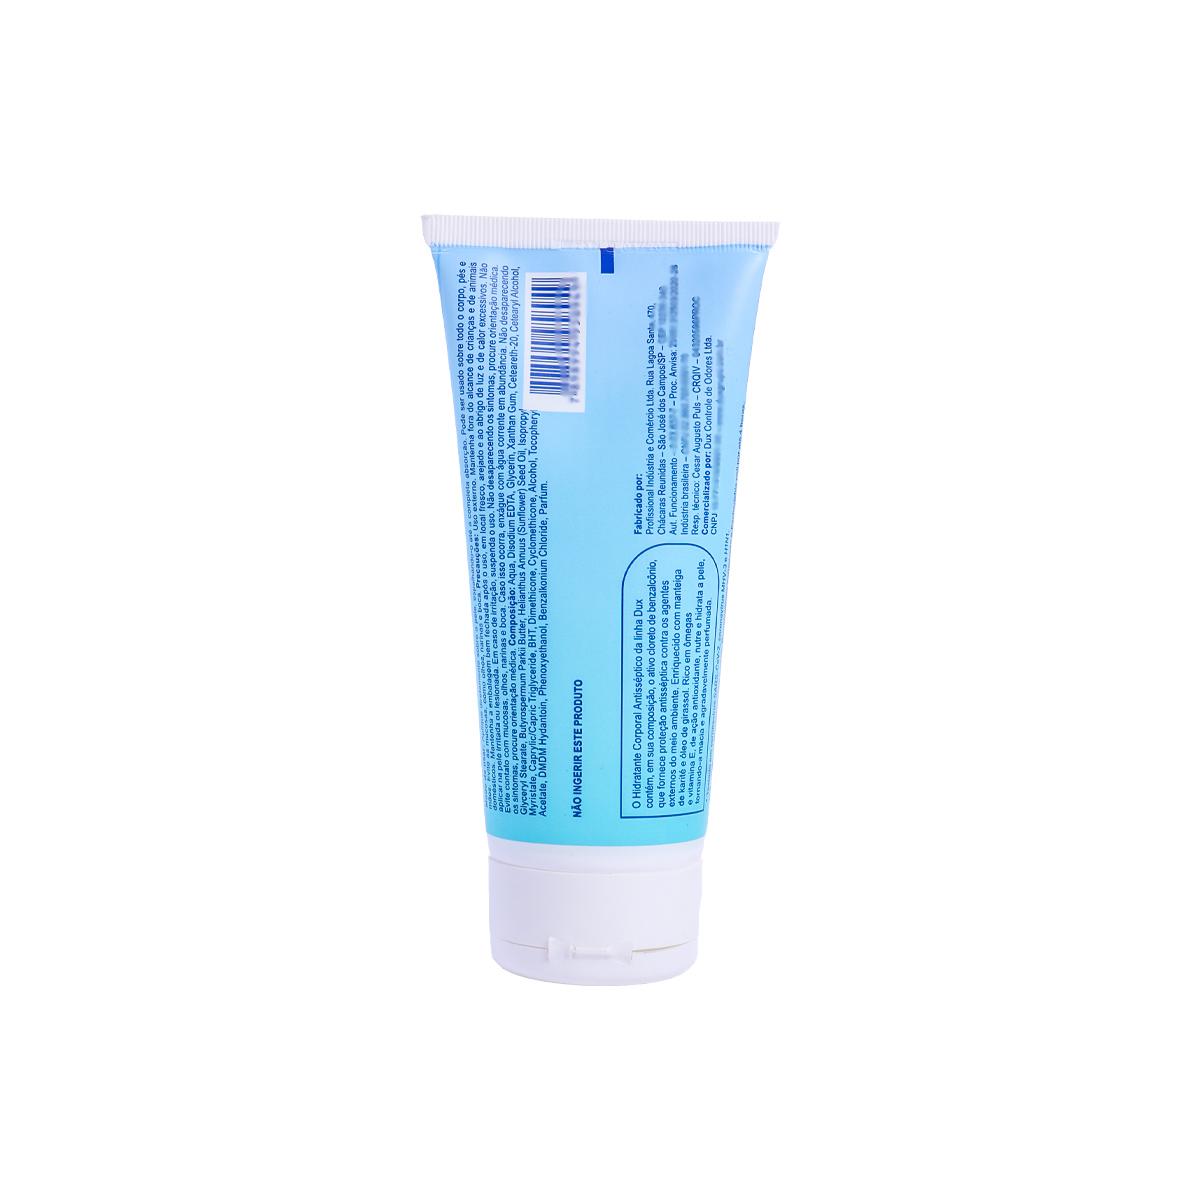 Kit Dux Defender Spray 500ml + Dux Defender Hidratante Antisseptico 200g